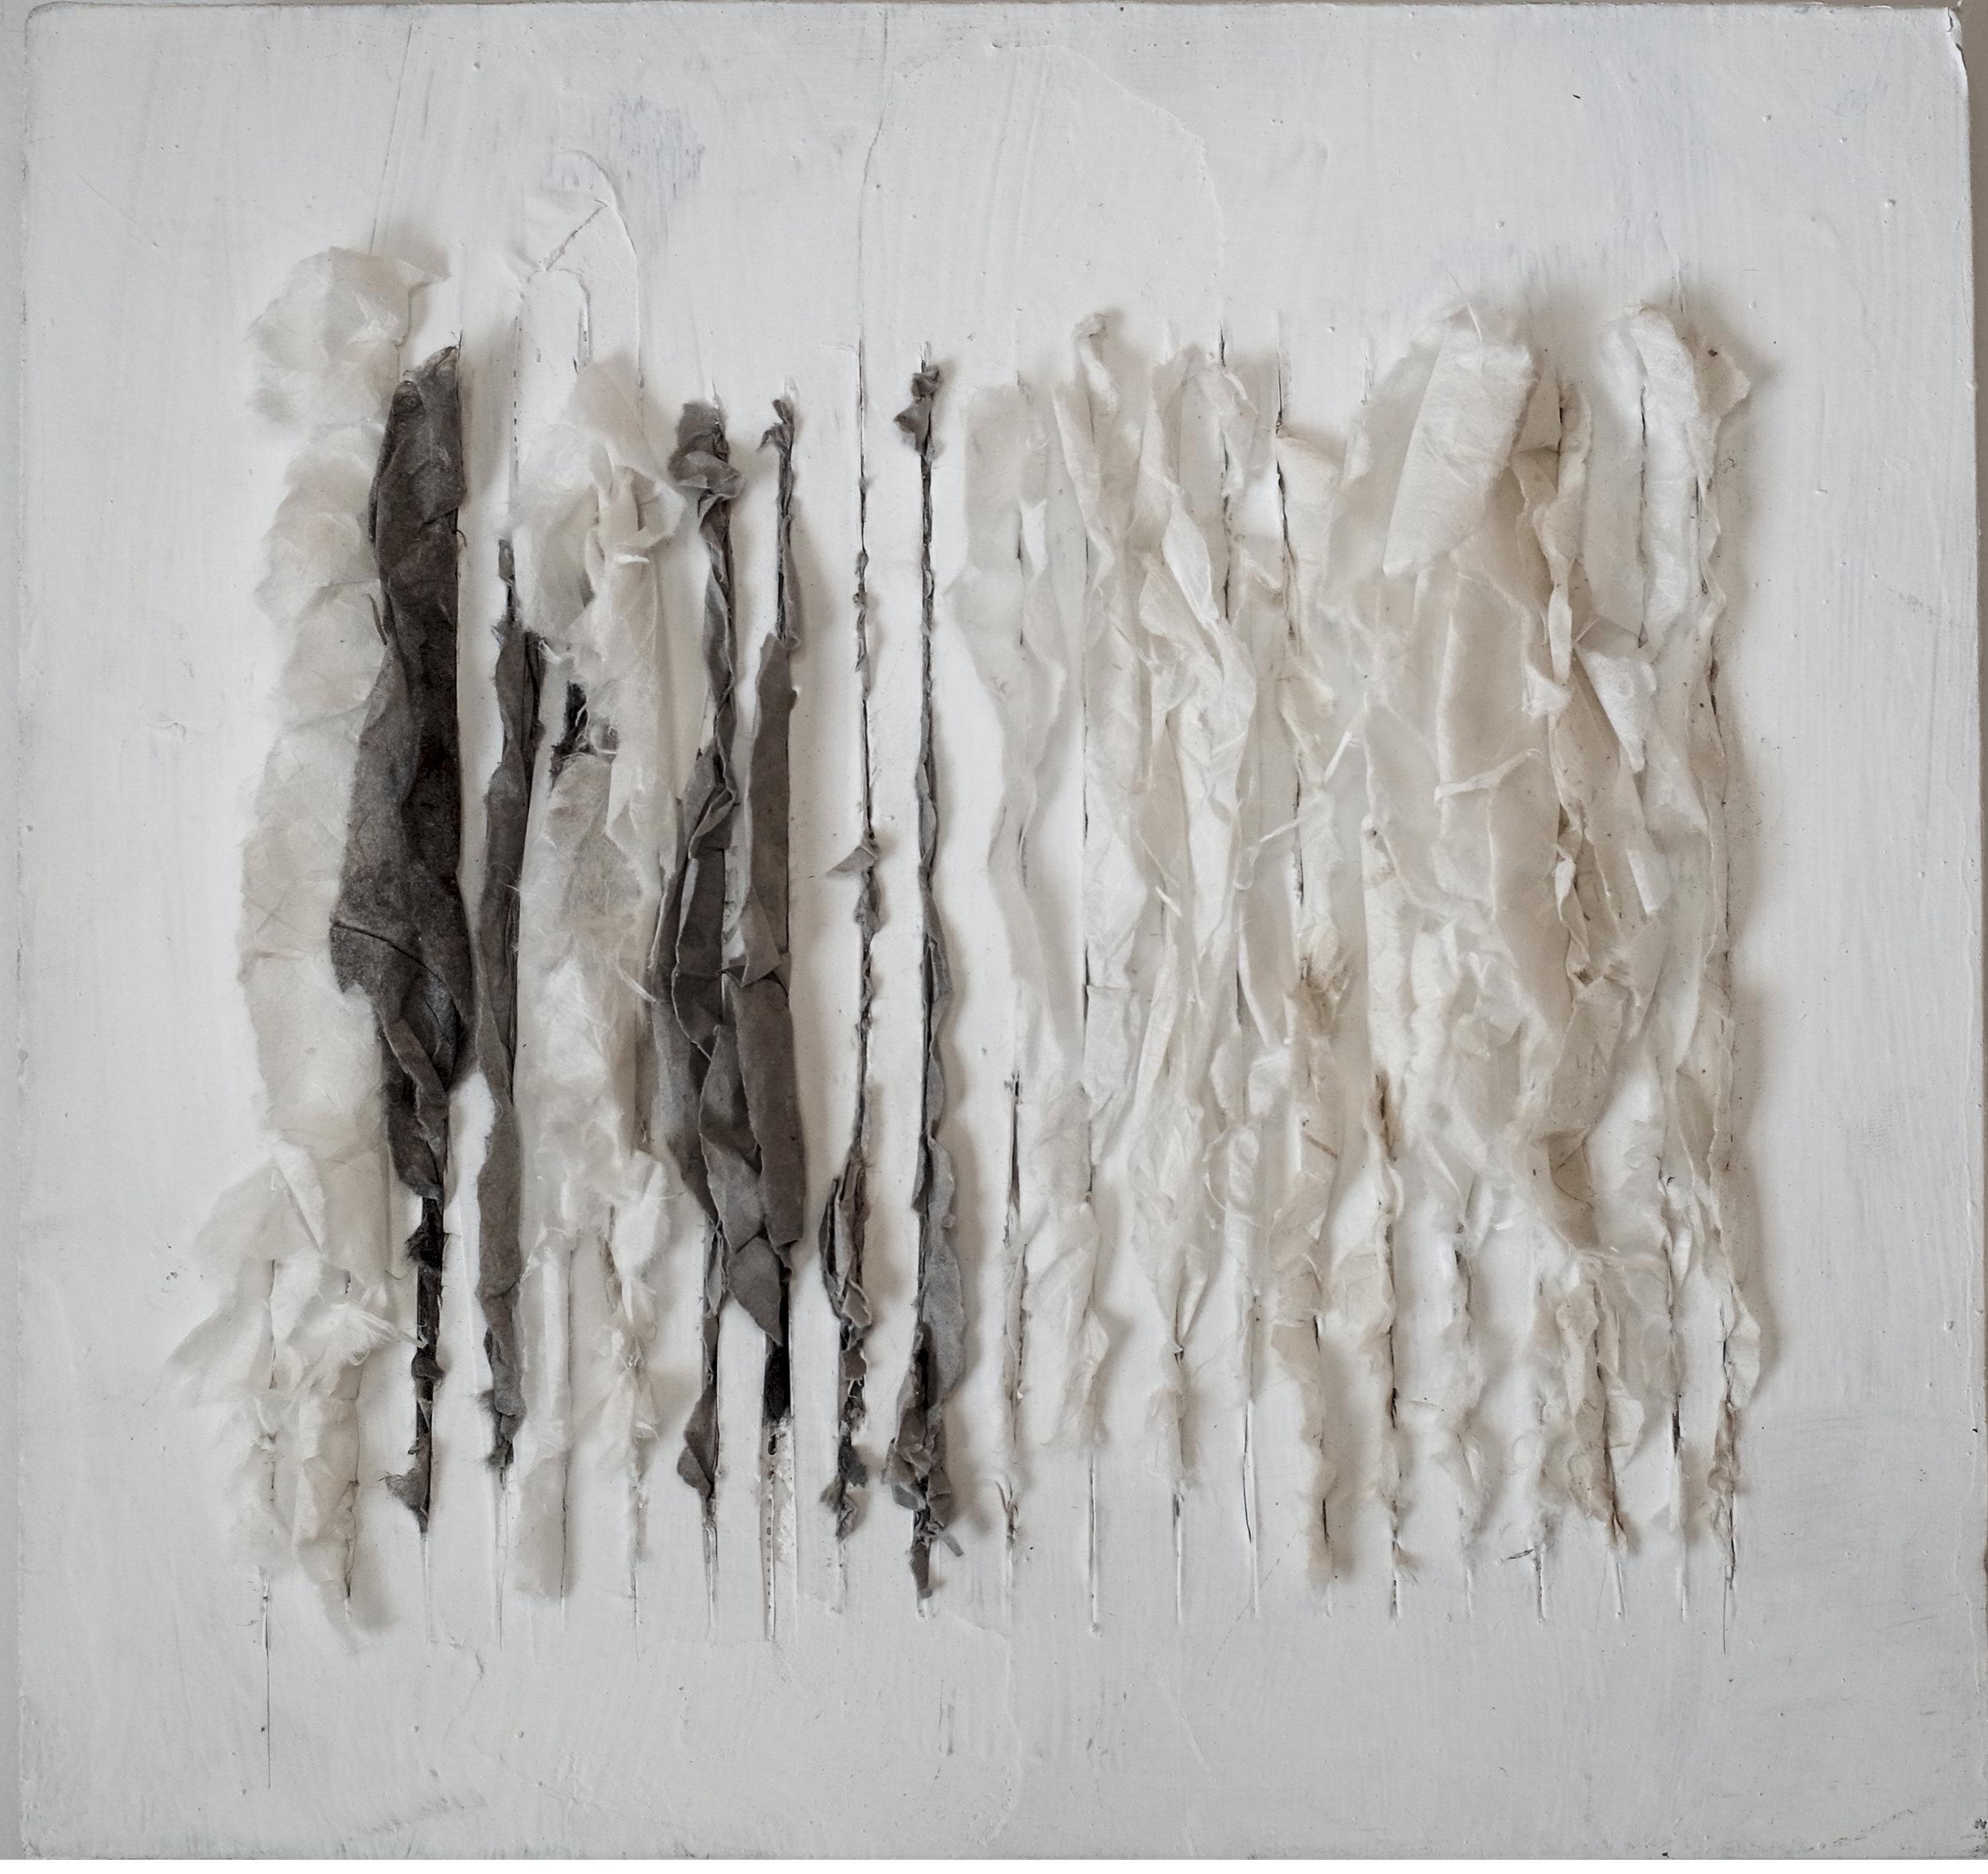 Lin Yan,  Drizzling #4 细雨4 , 12 x 12 x 2 in., Xuan paper and ink on sheetrock board, 2017. ©2017 Lin Yan, courtesy Fou Gallery.